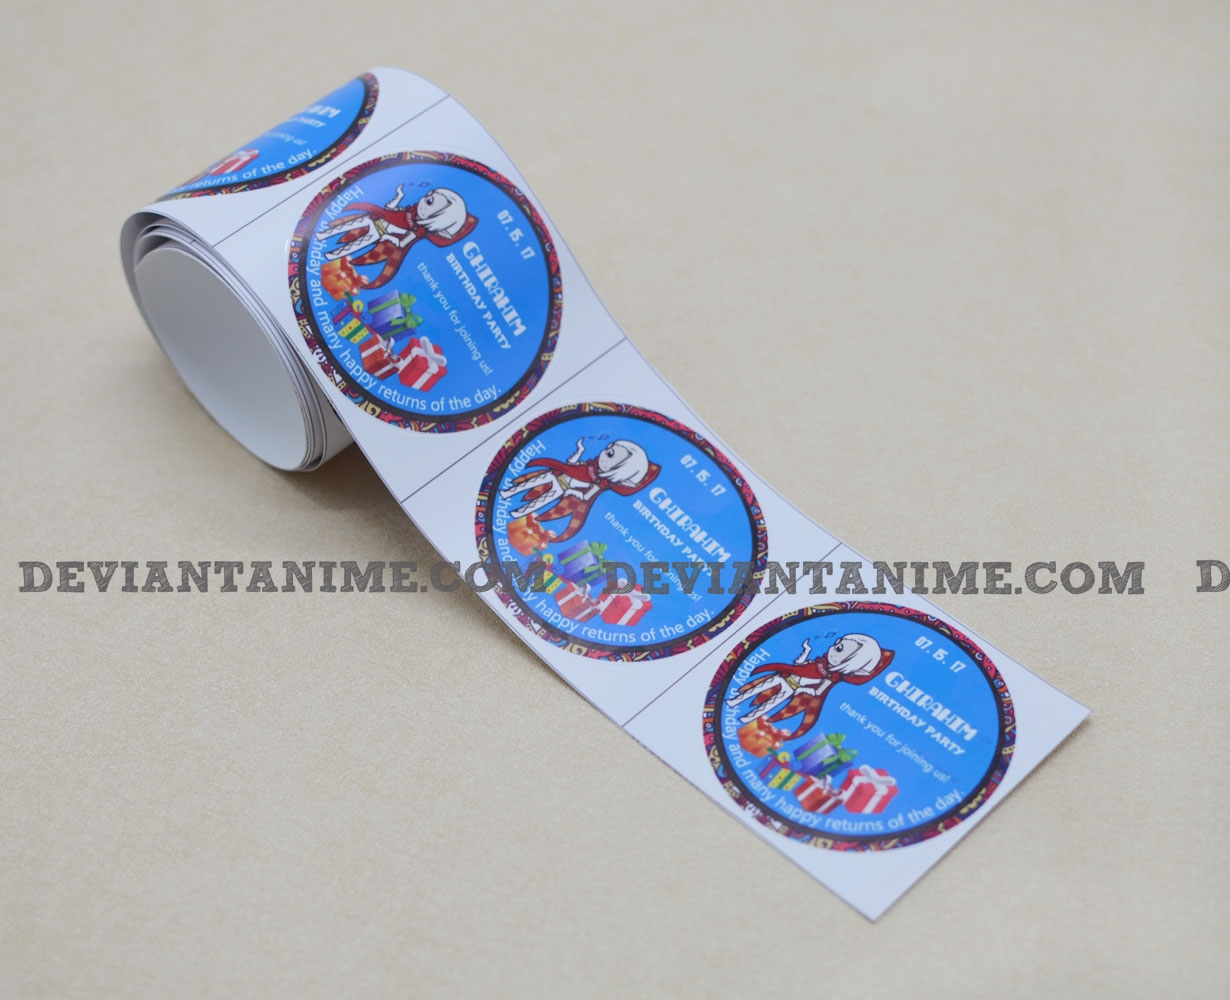 40491-Custom-Stickers-2-1.jpg